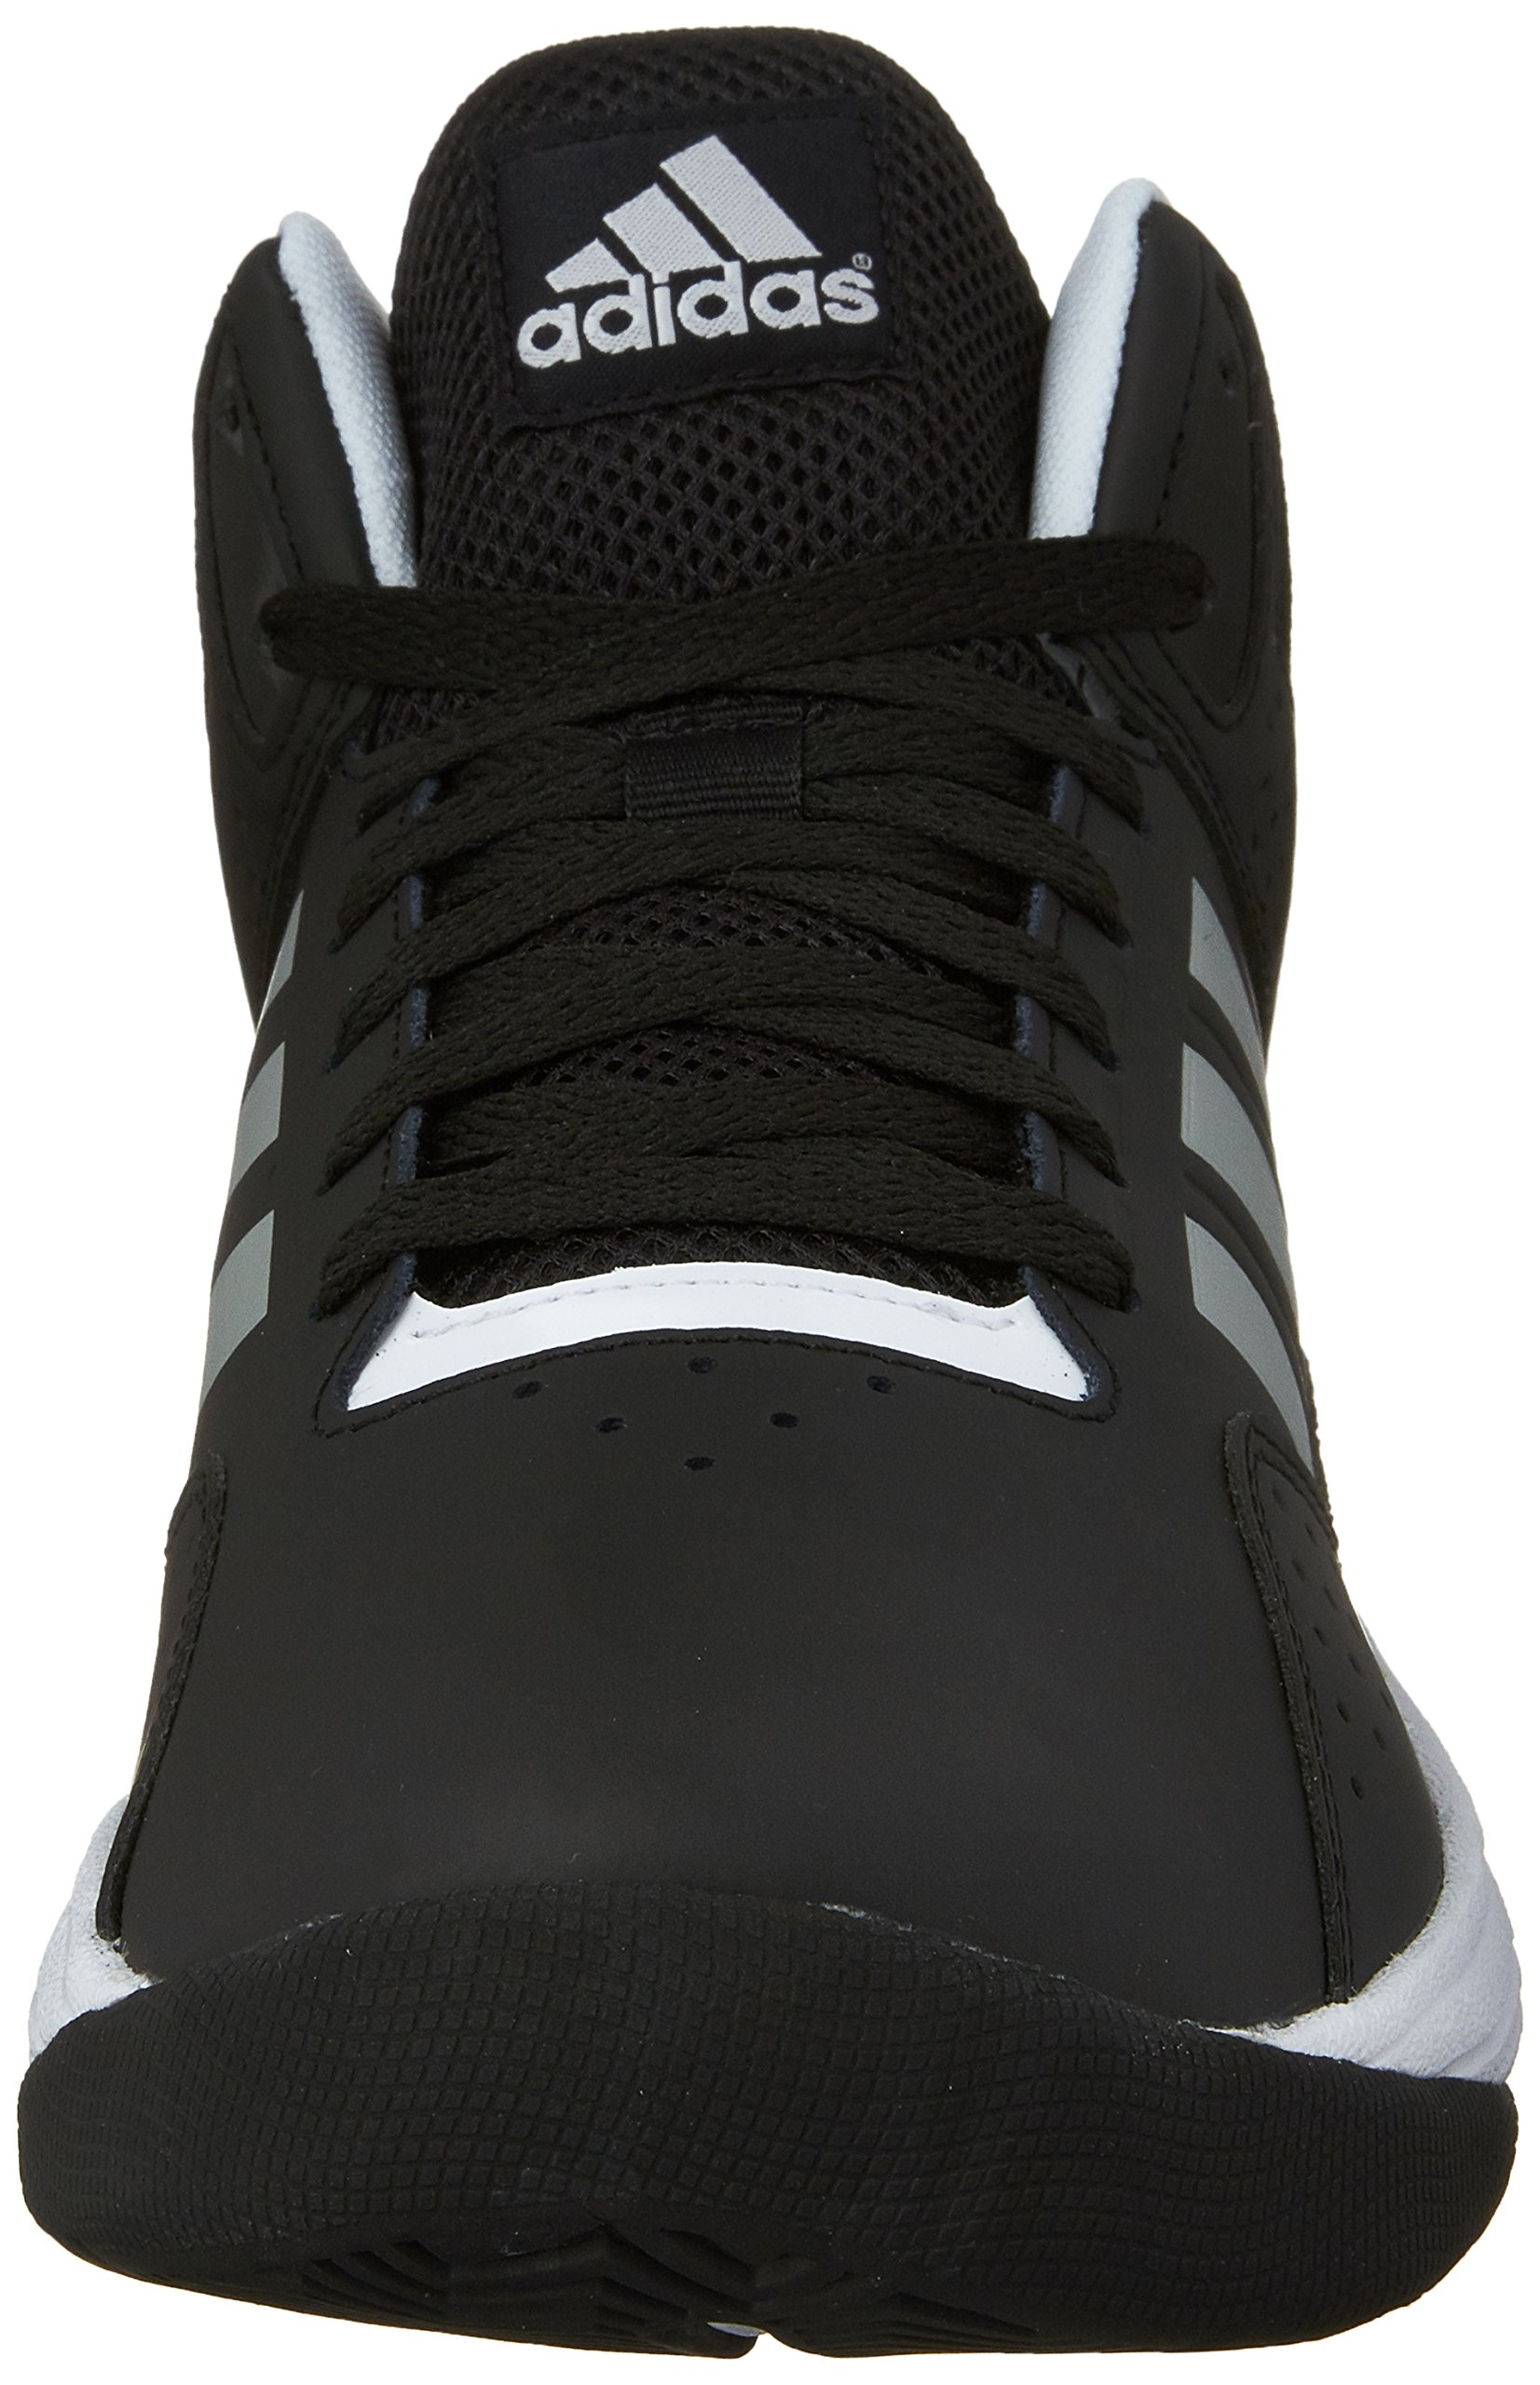 6316e46cb39eb7 adidas NEO Men s Cloudfoam Ilation Mid Basketball Shoe